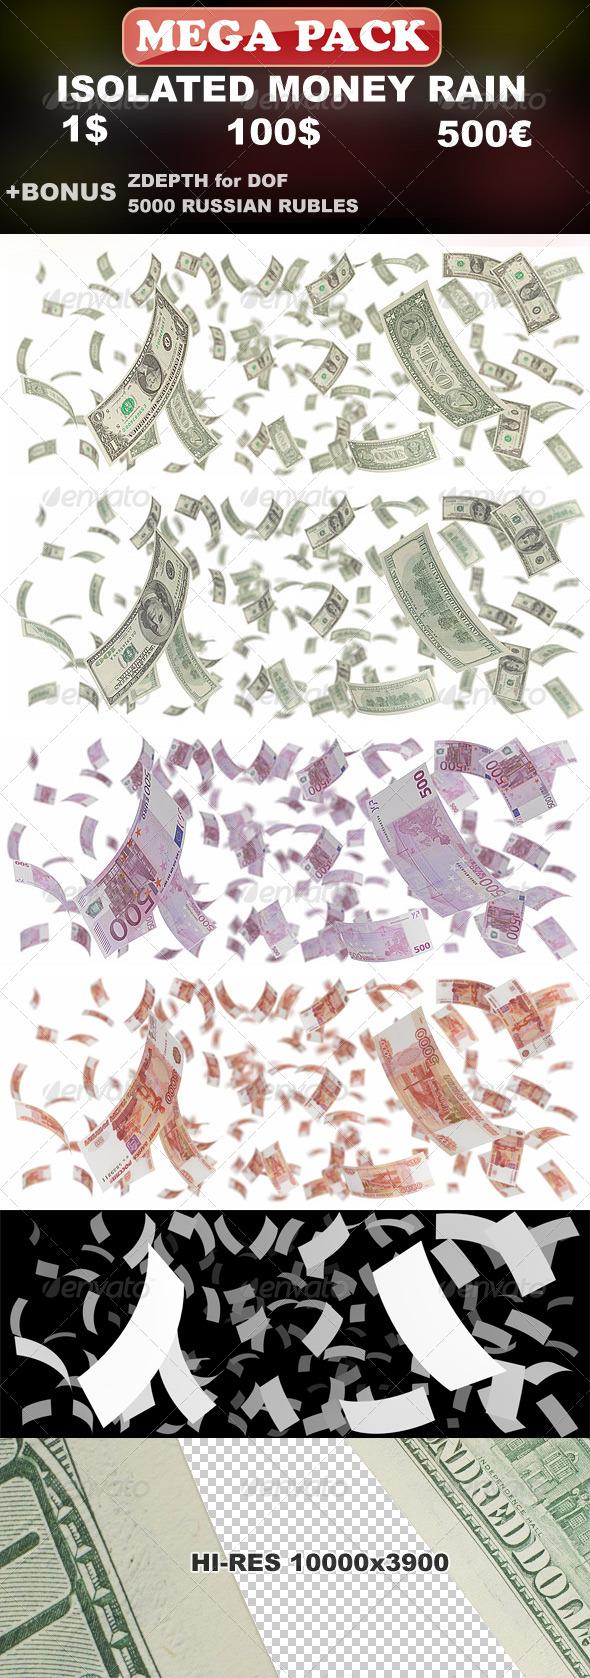 GraphicRiver Isolated Money Rain Mega-Pack 1$ 100$ 500Ђ 149456